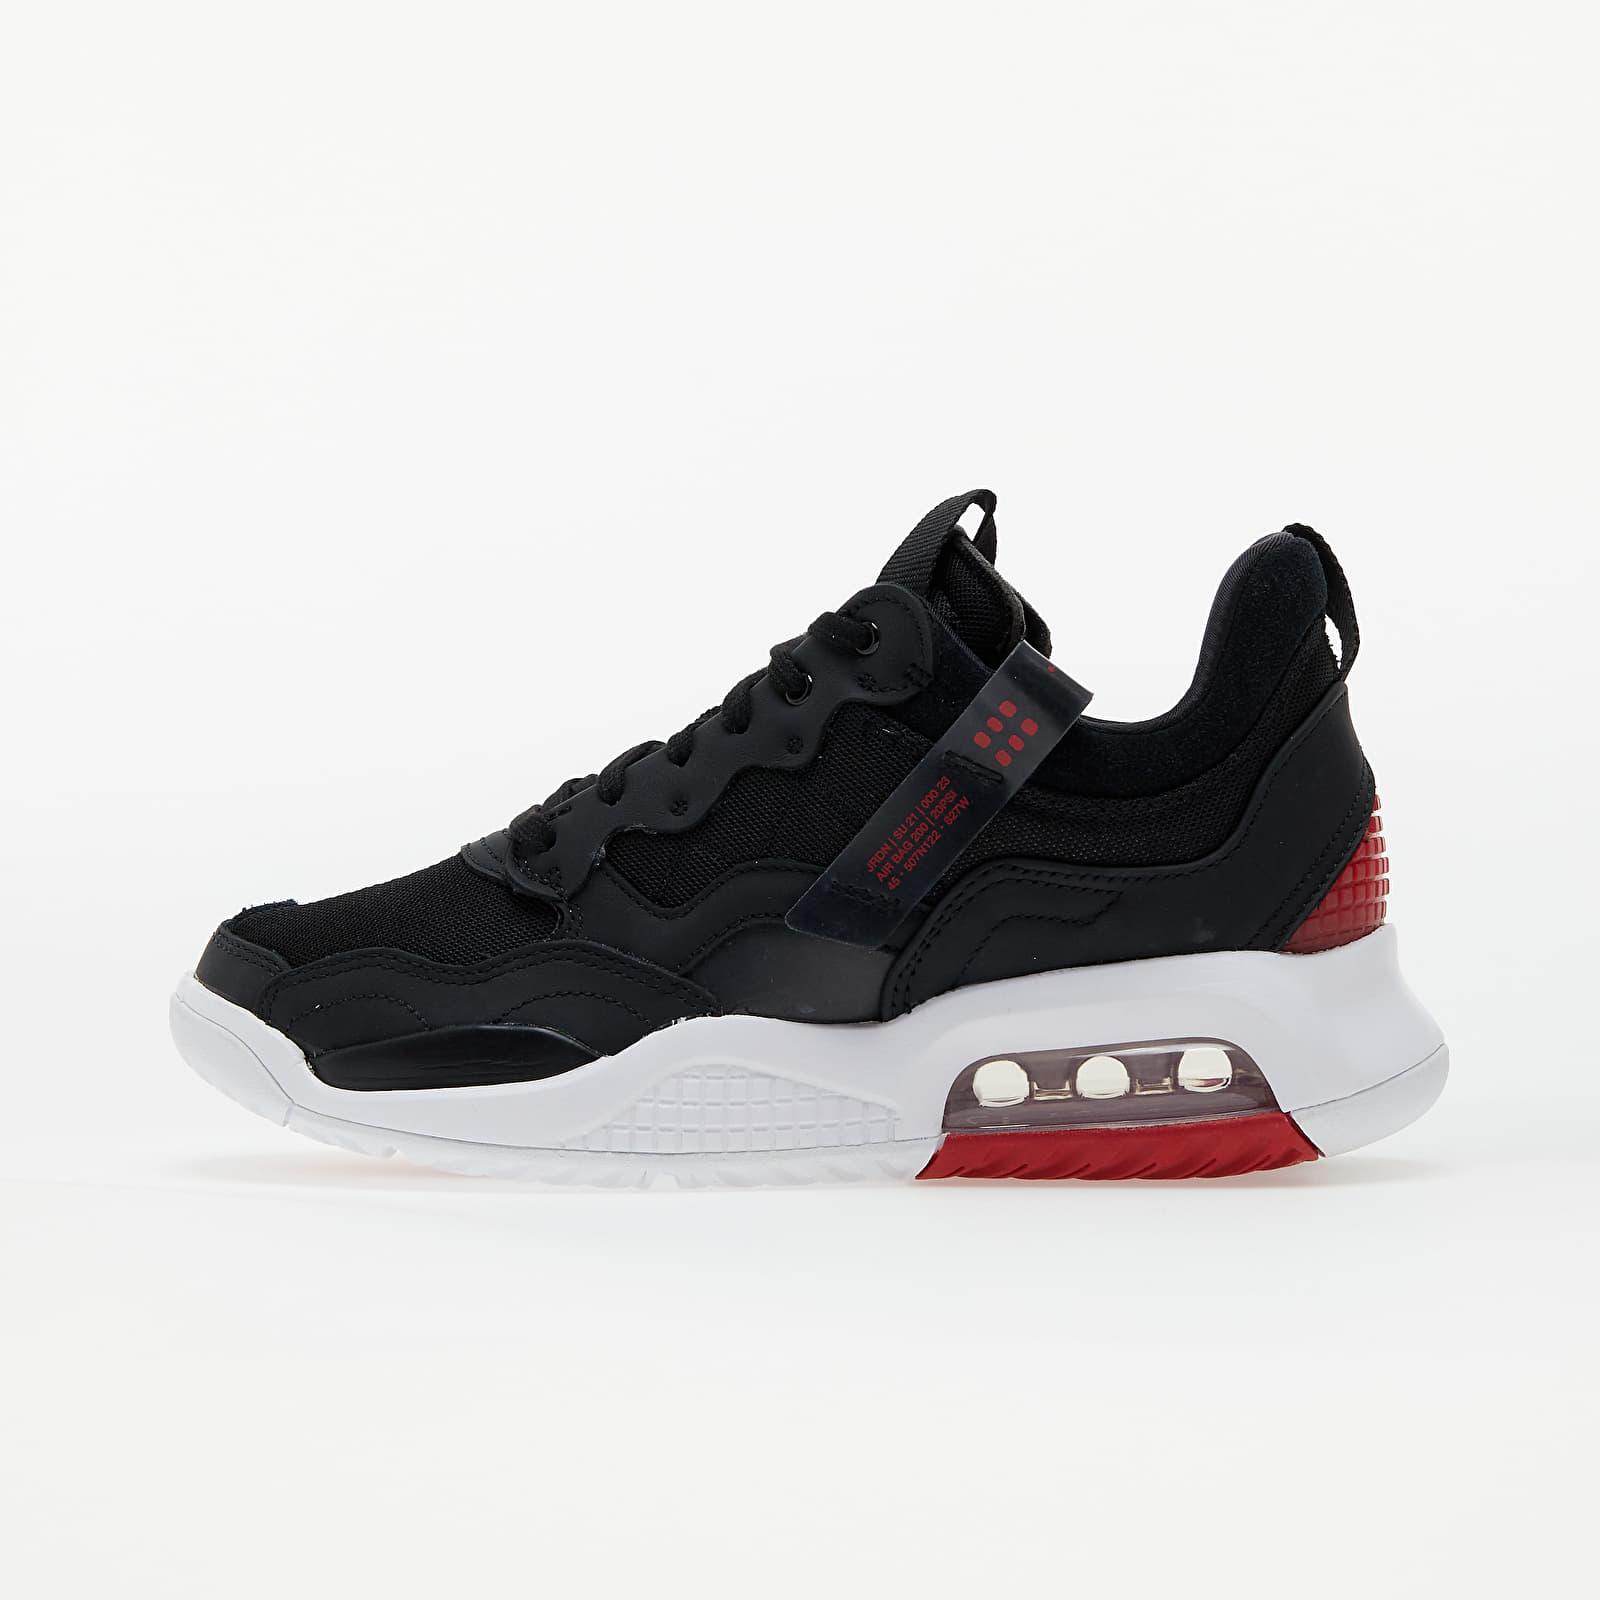 Jordan MA2 Black/ University Red-Gym Red-White EUR 41